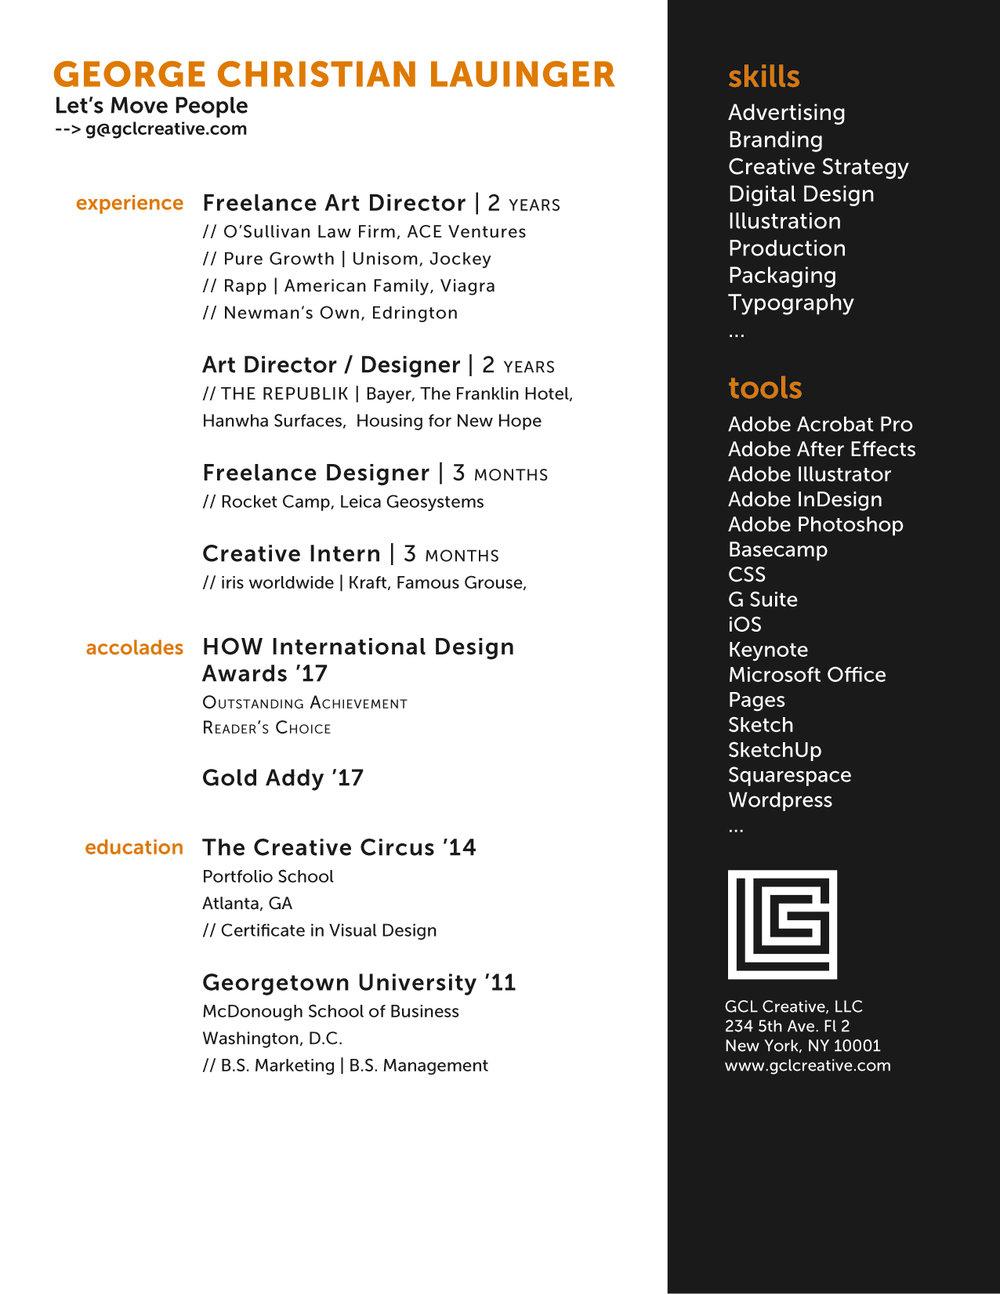 gcl-resume-mw-02.jpg